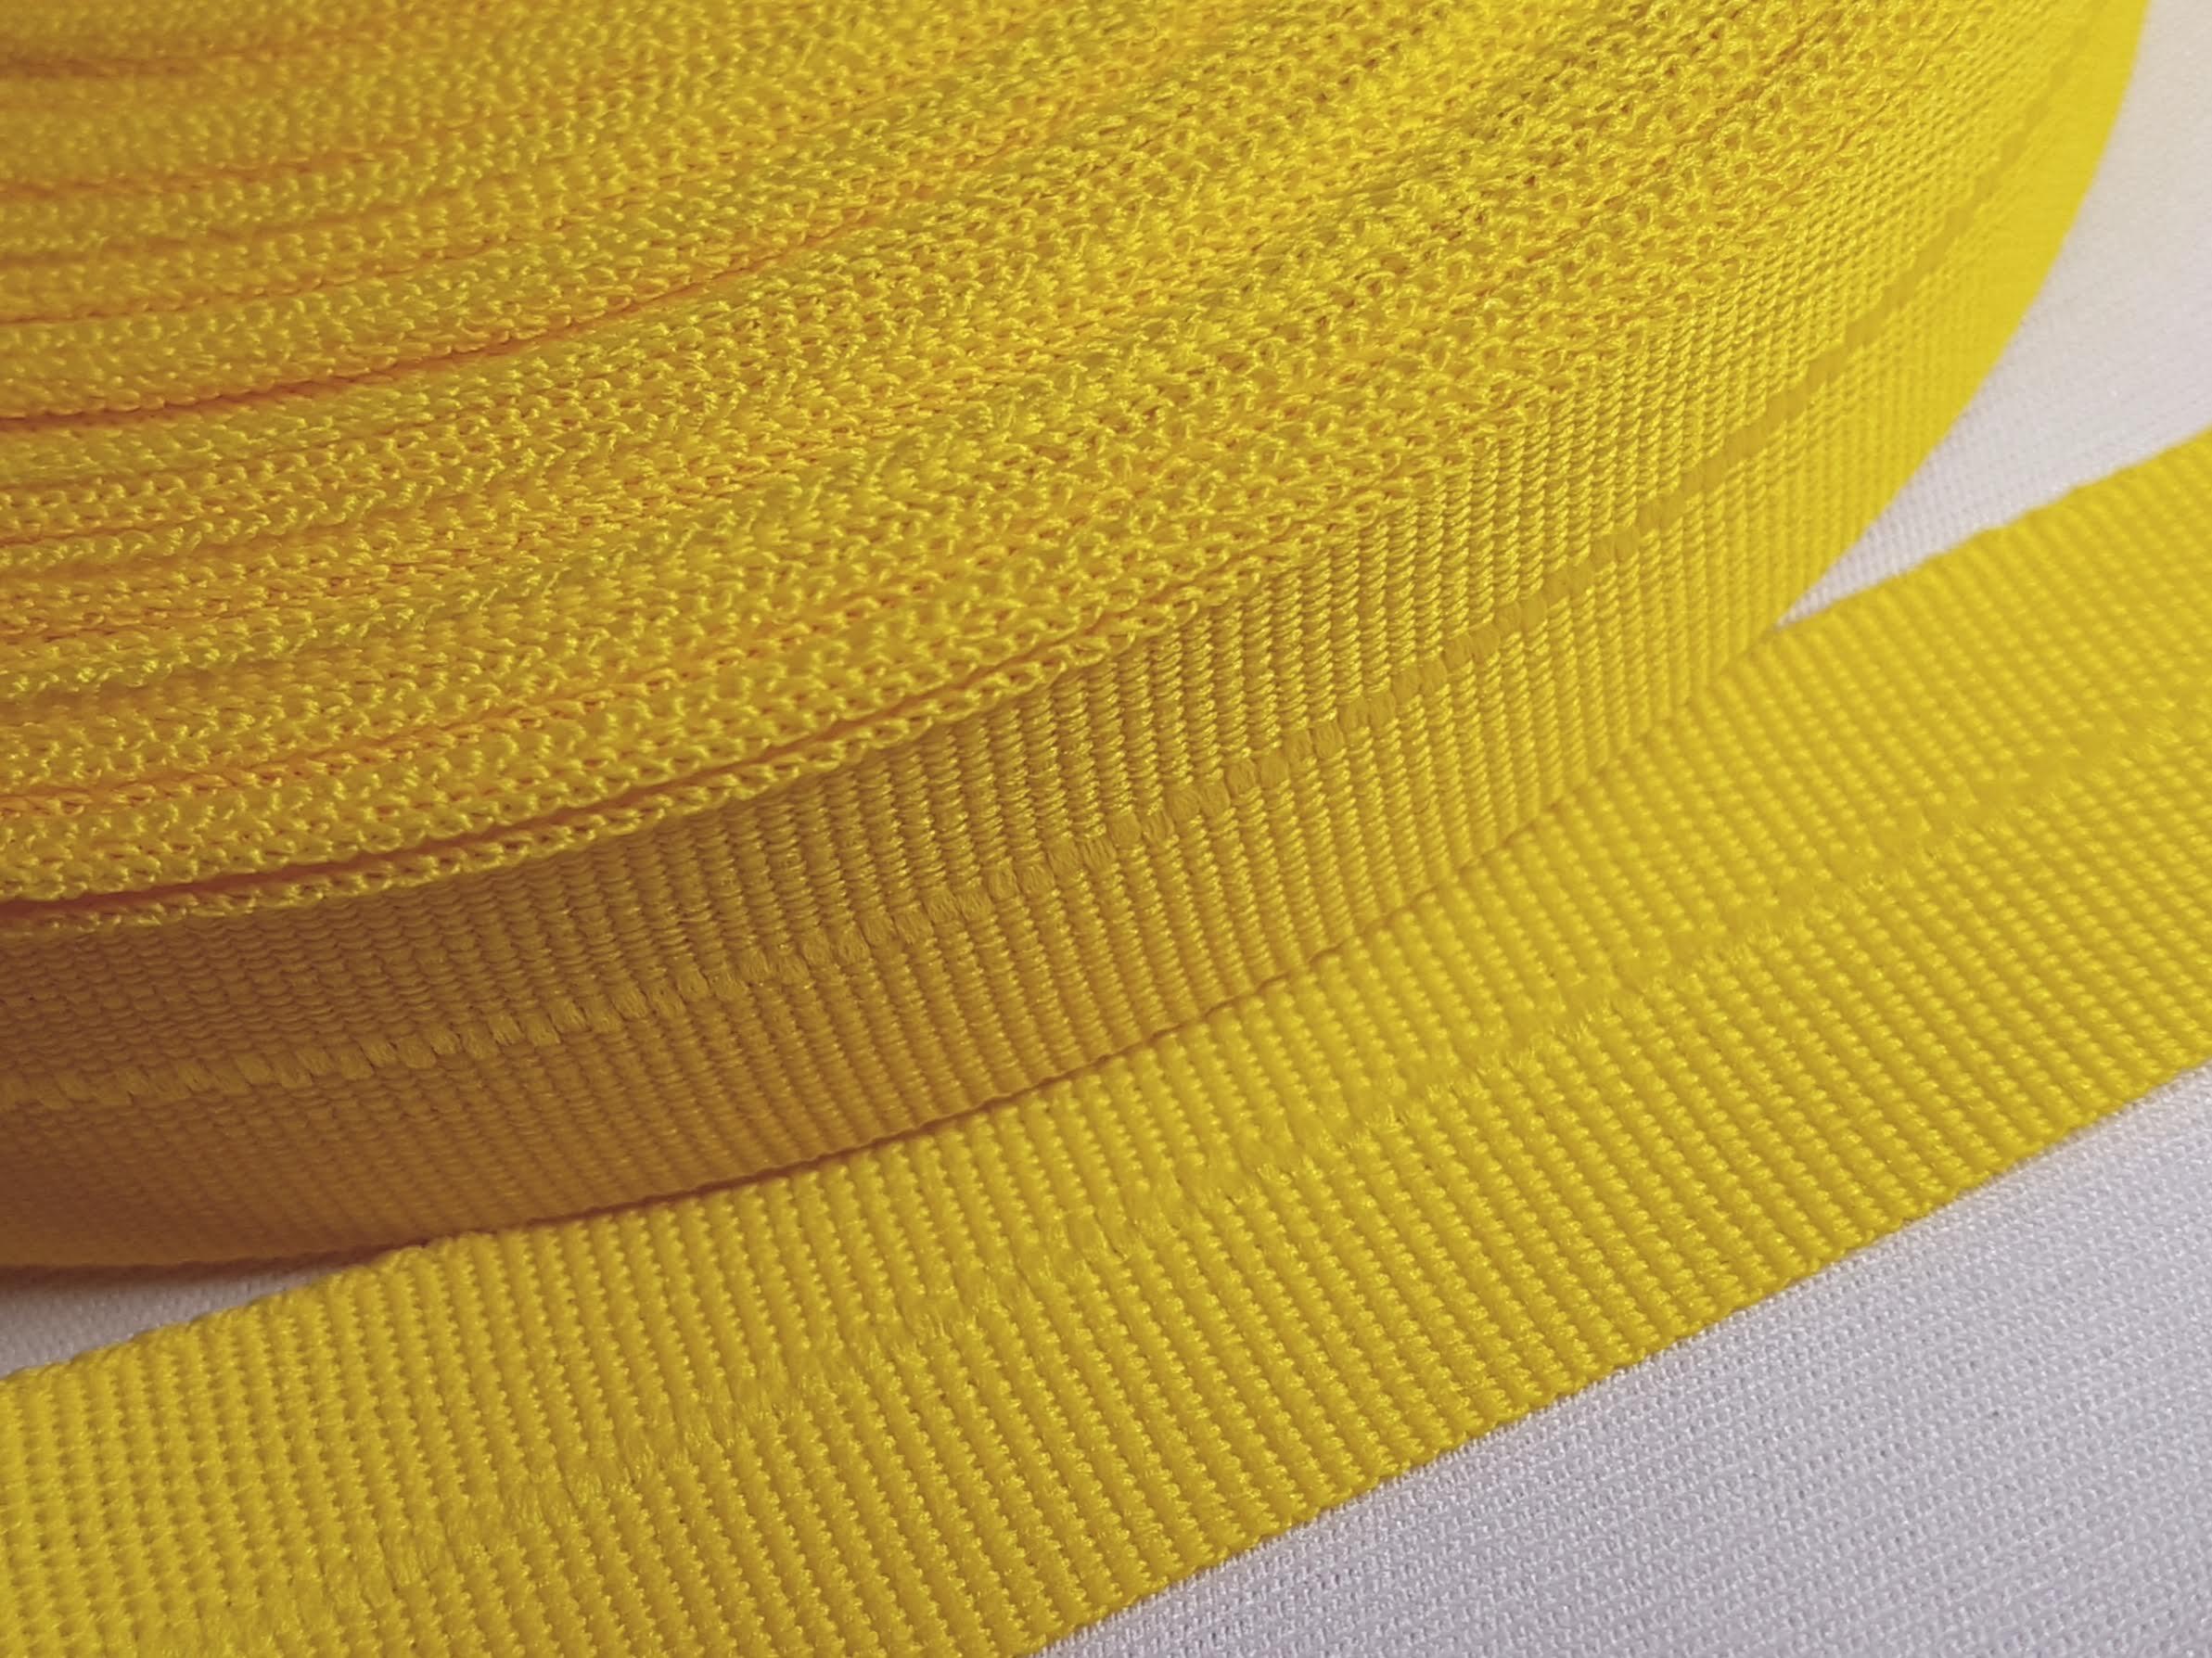 Viés Industrial (gorgurão) Amarelo c/ 5mt